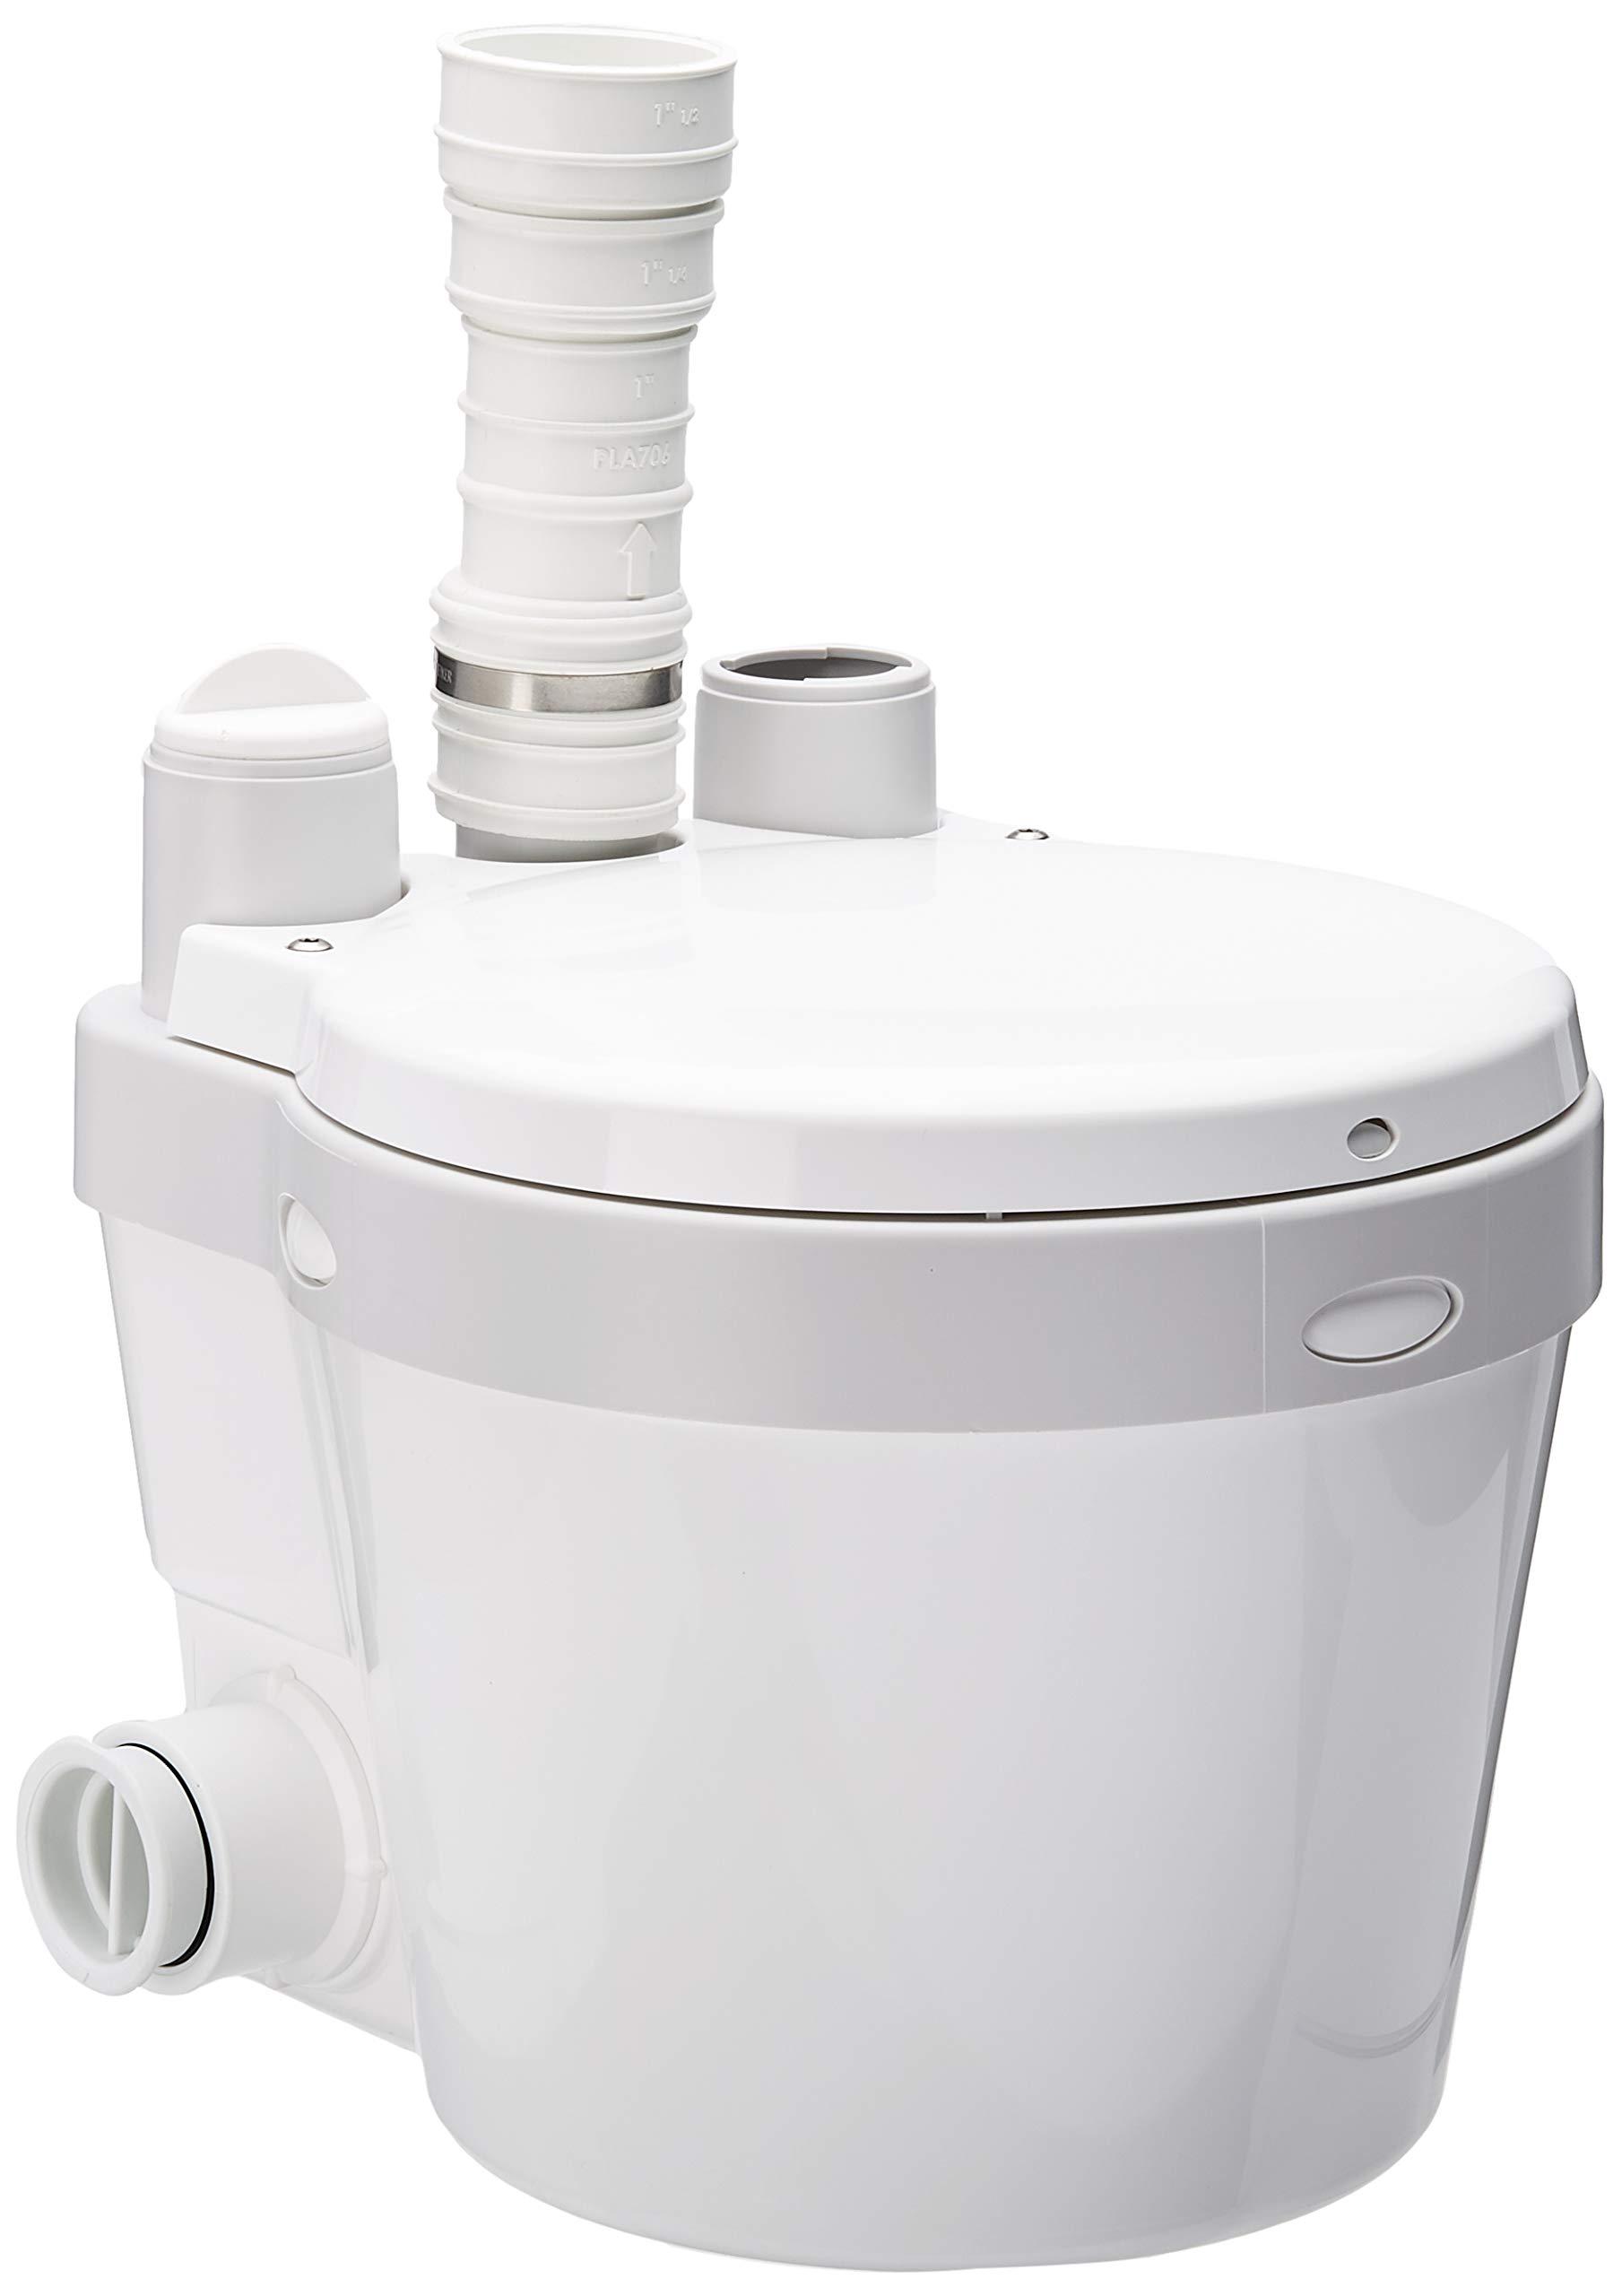 Saniflo 021 Saniswift Gray Water Pump by Saniflo